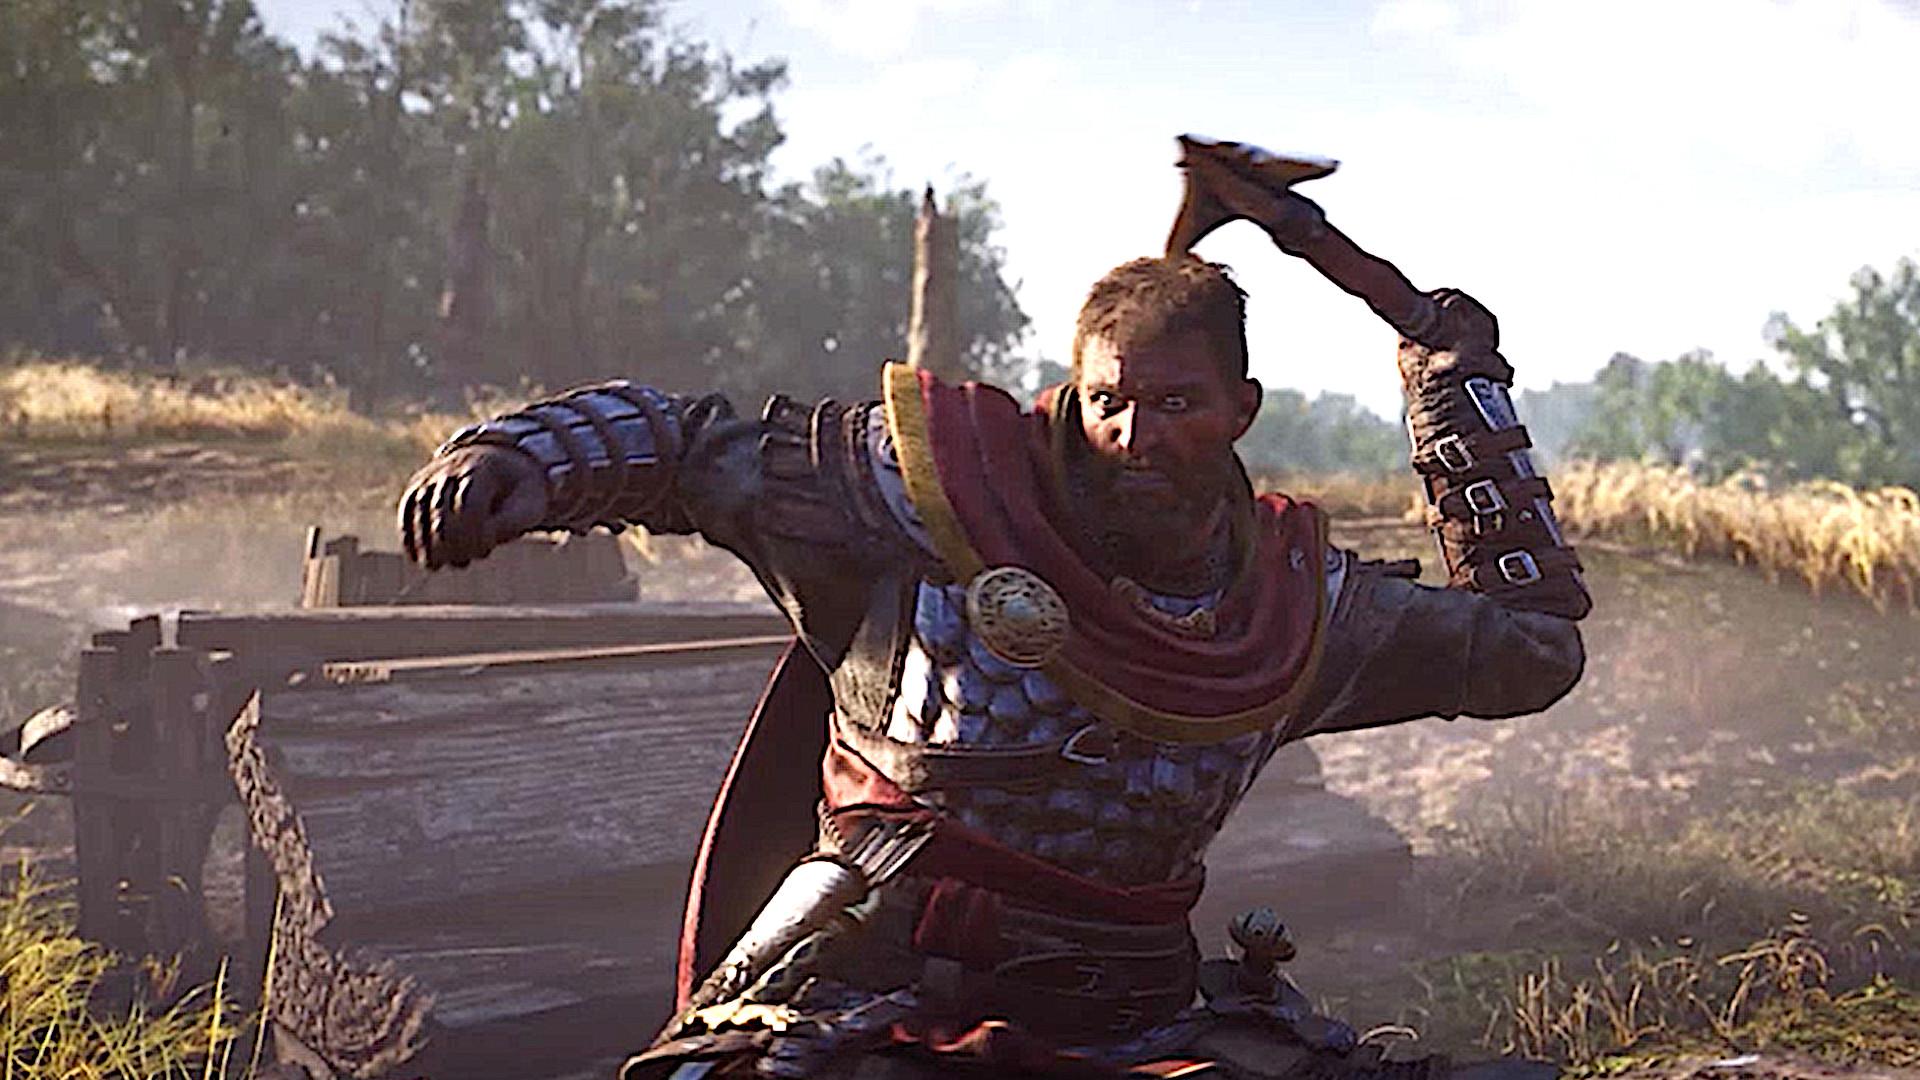 Assassin's Creed Valhalla devs explain how missile reversal works